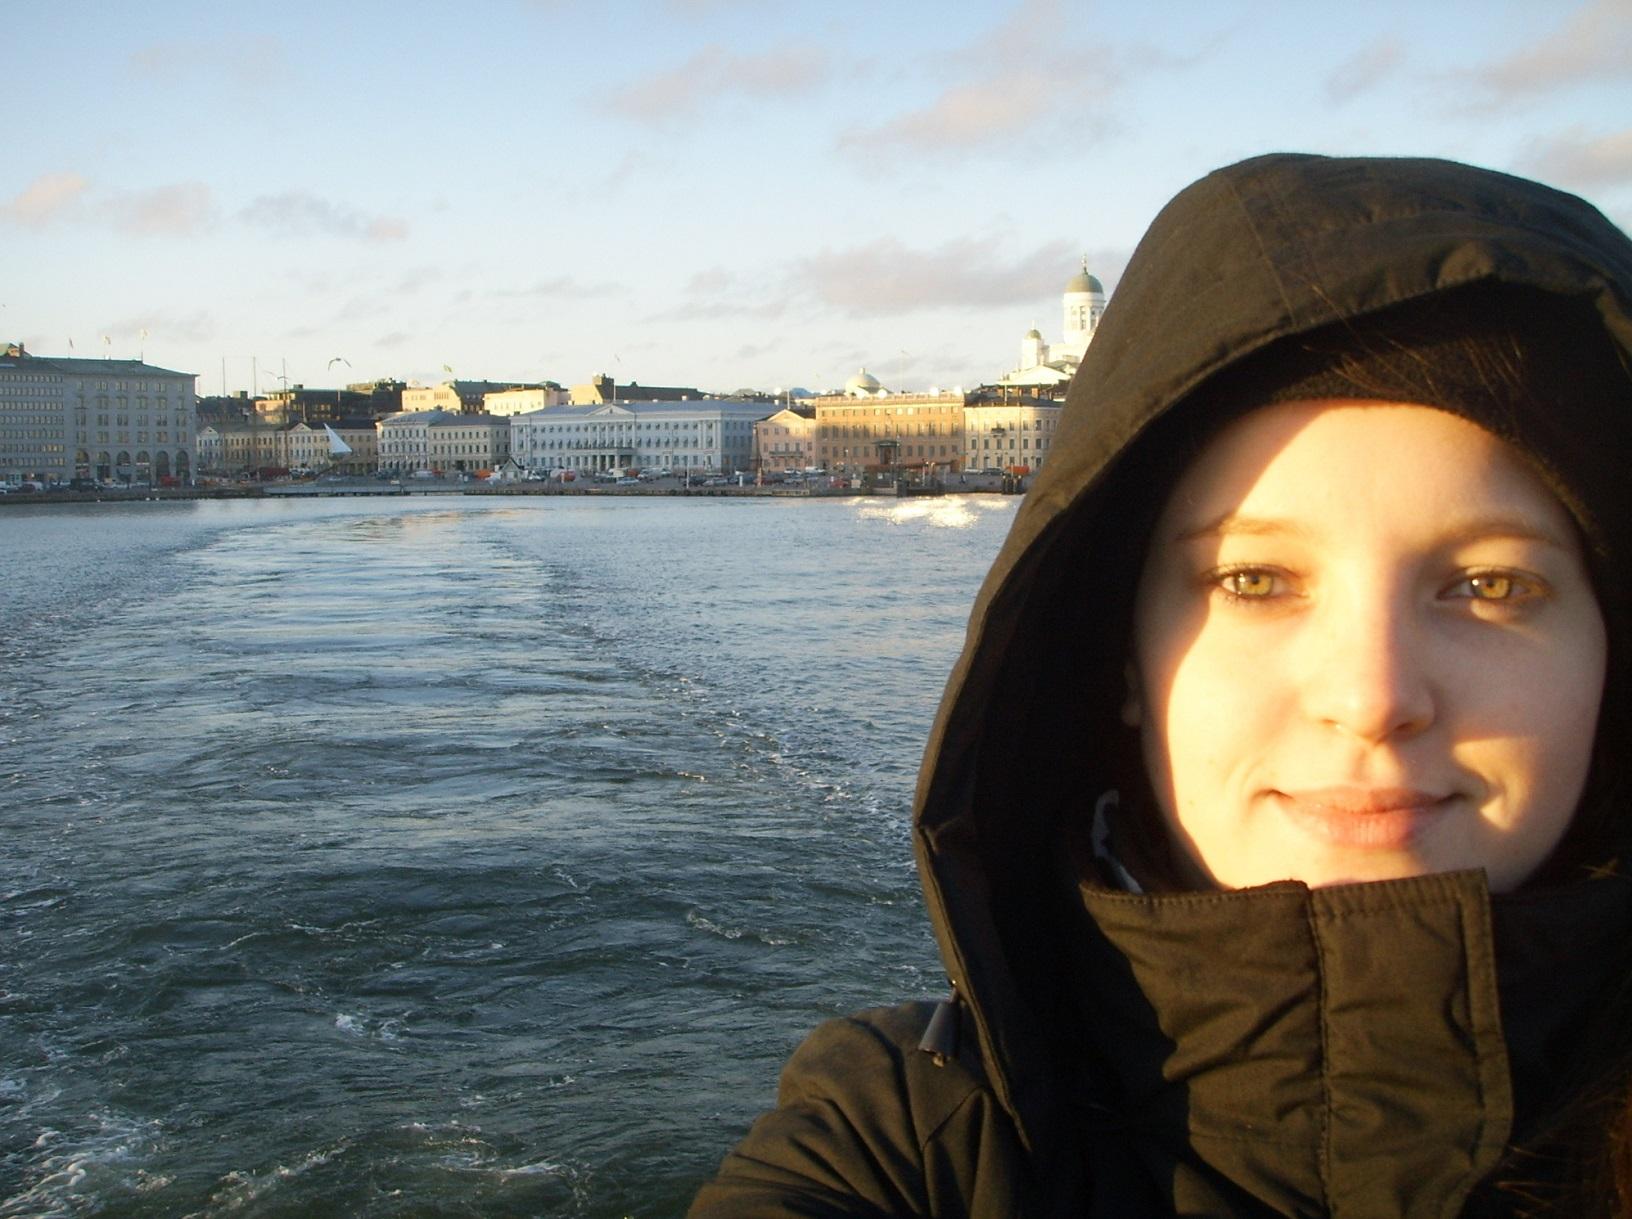 Helsinki Suomenlinna lautta